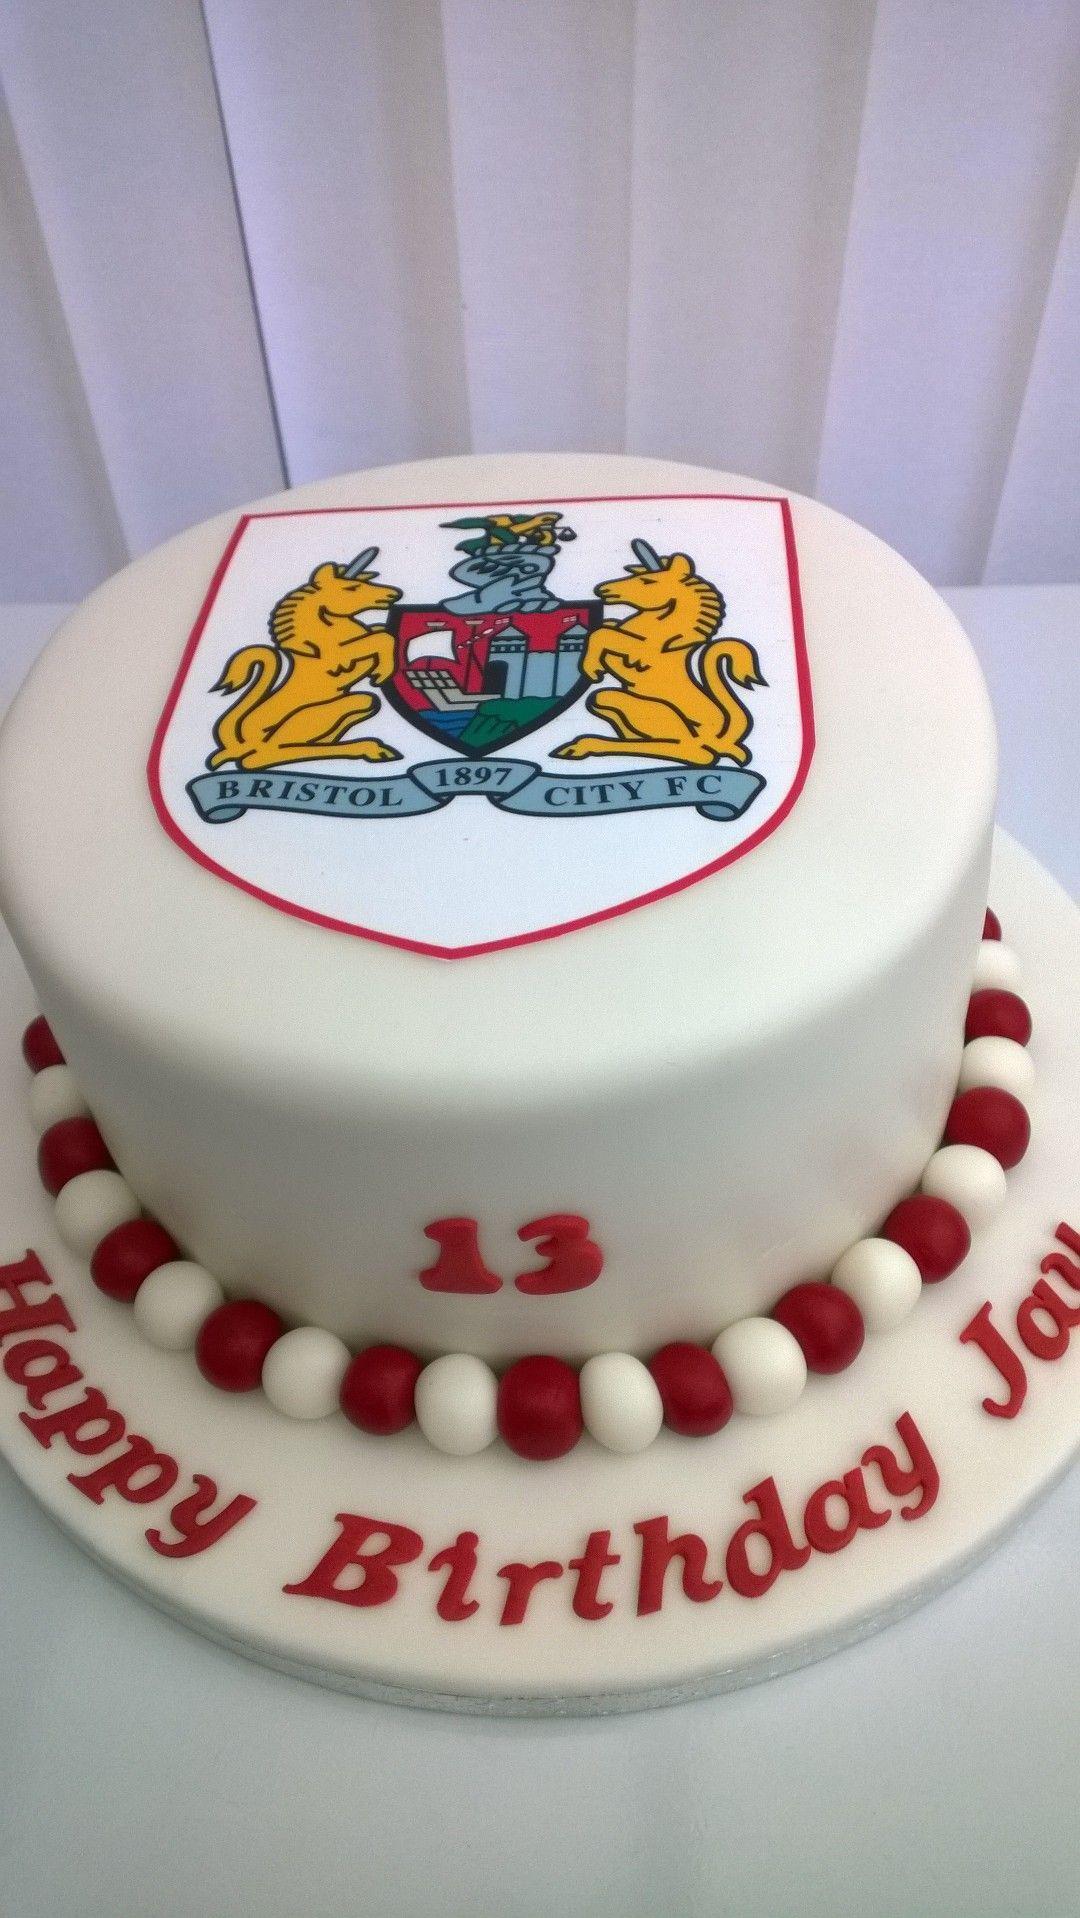 Bristol city football club birthday cake cake football